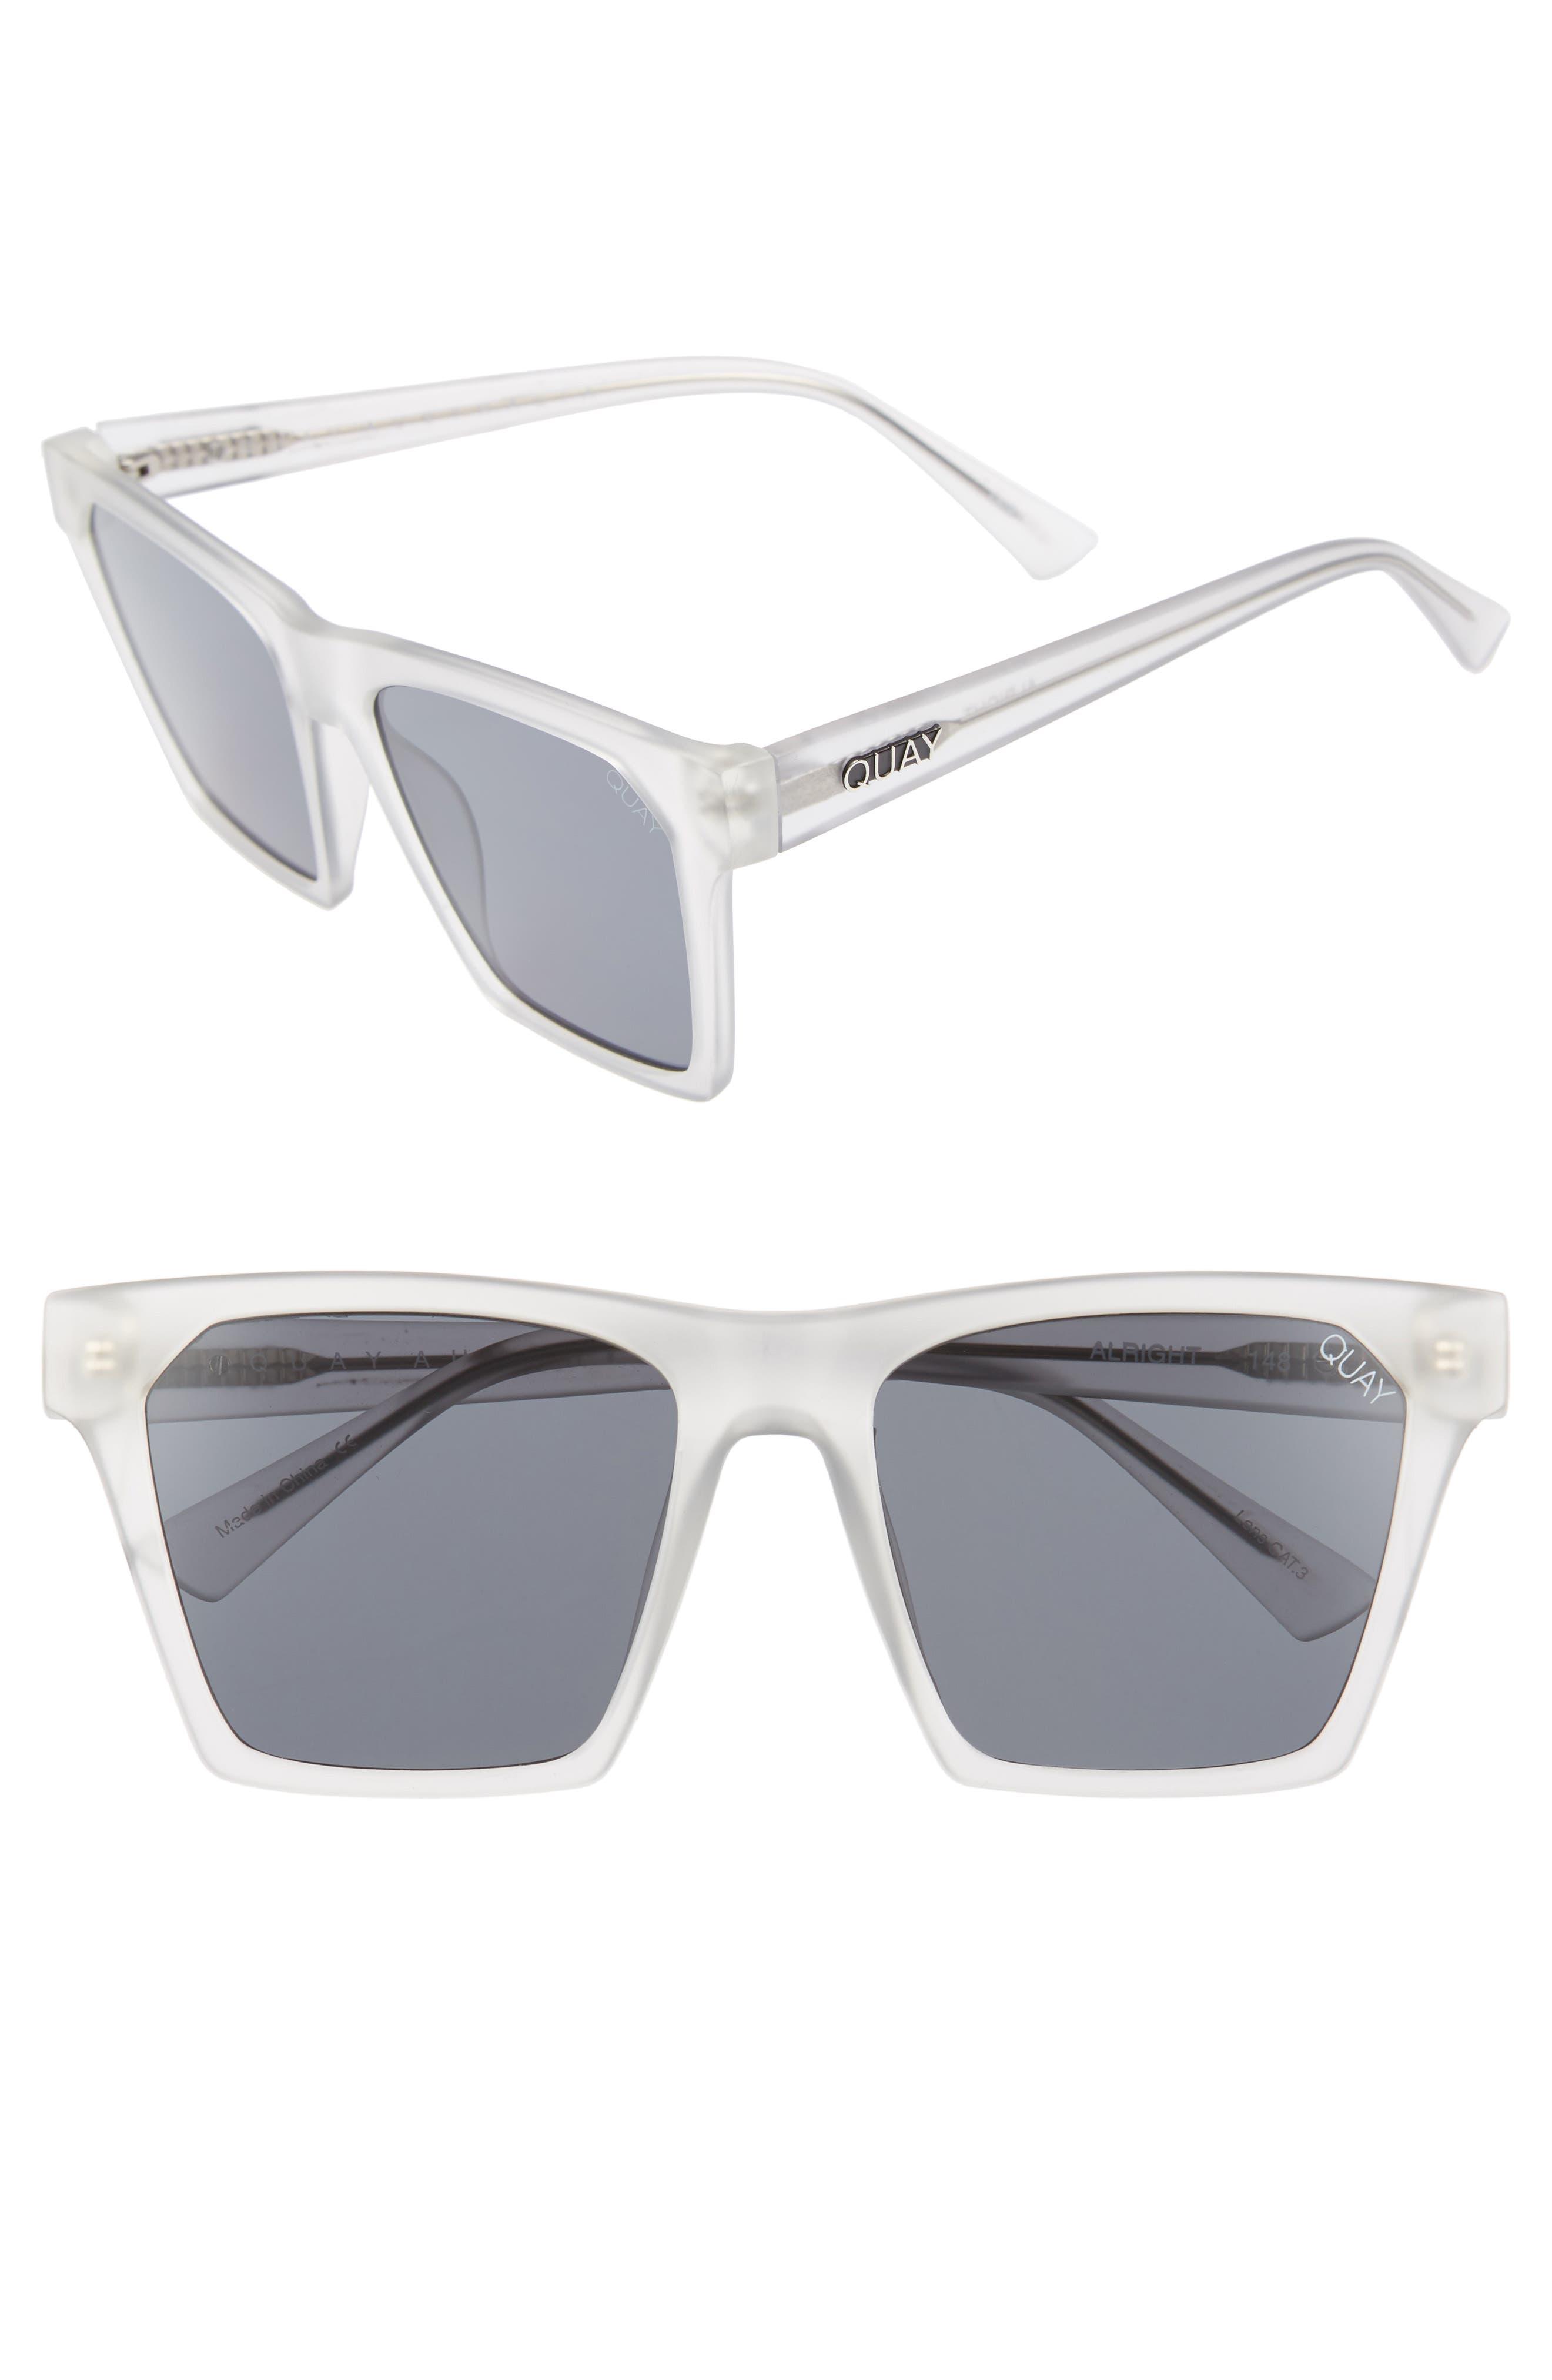 Quay Australia x Missguided Alright 55mm Square Sunglasses